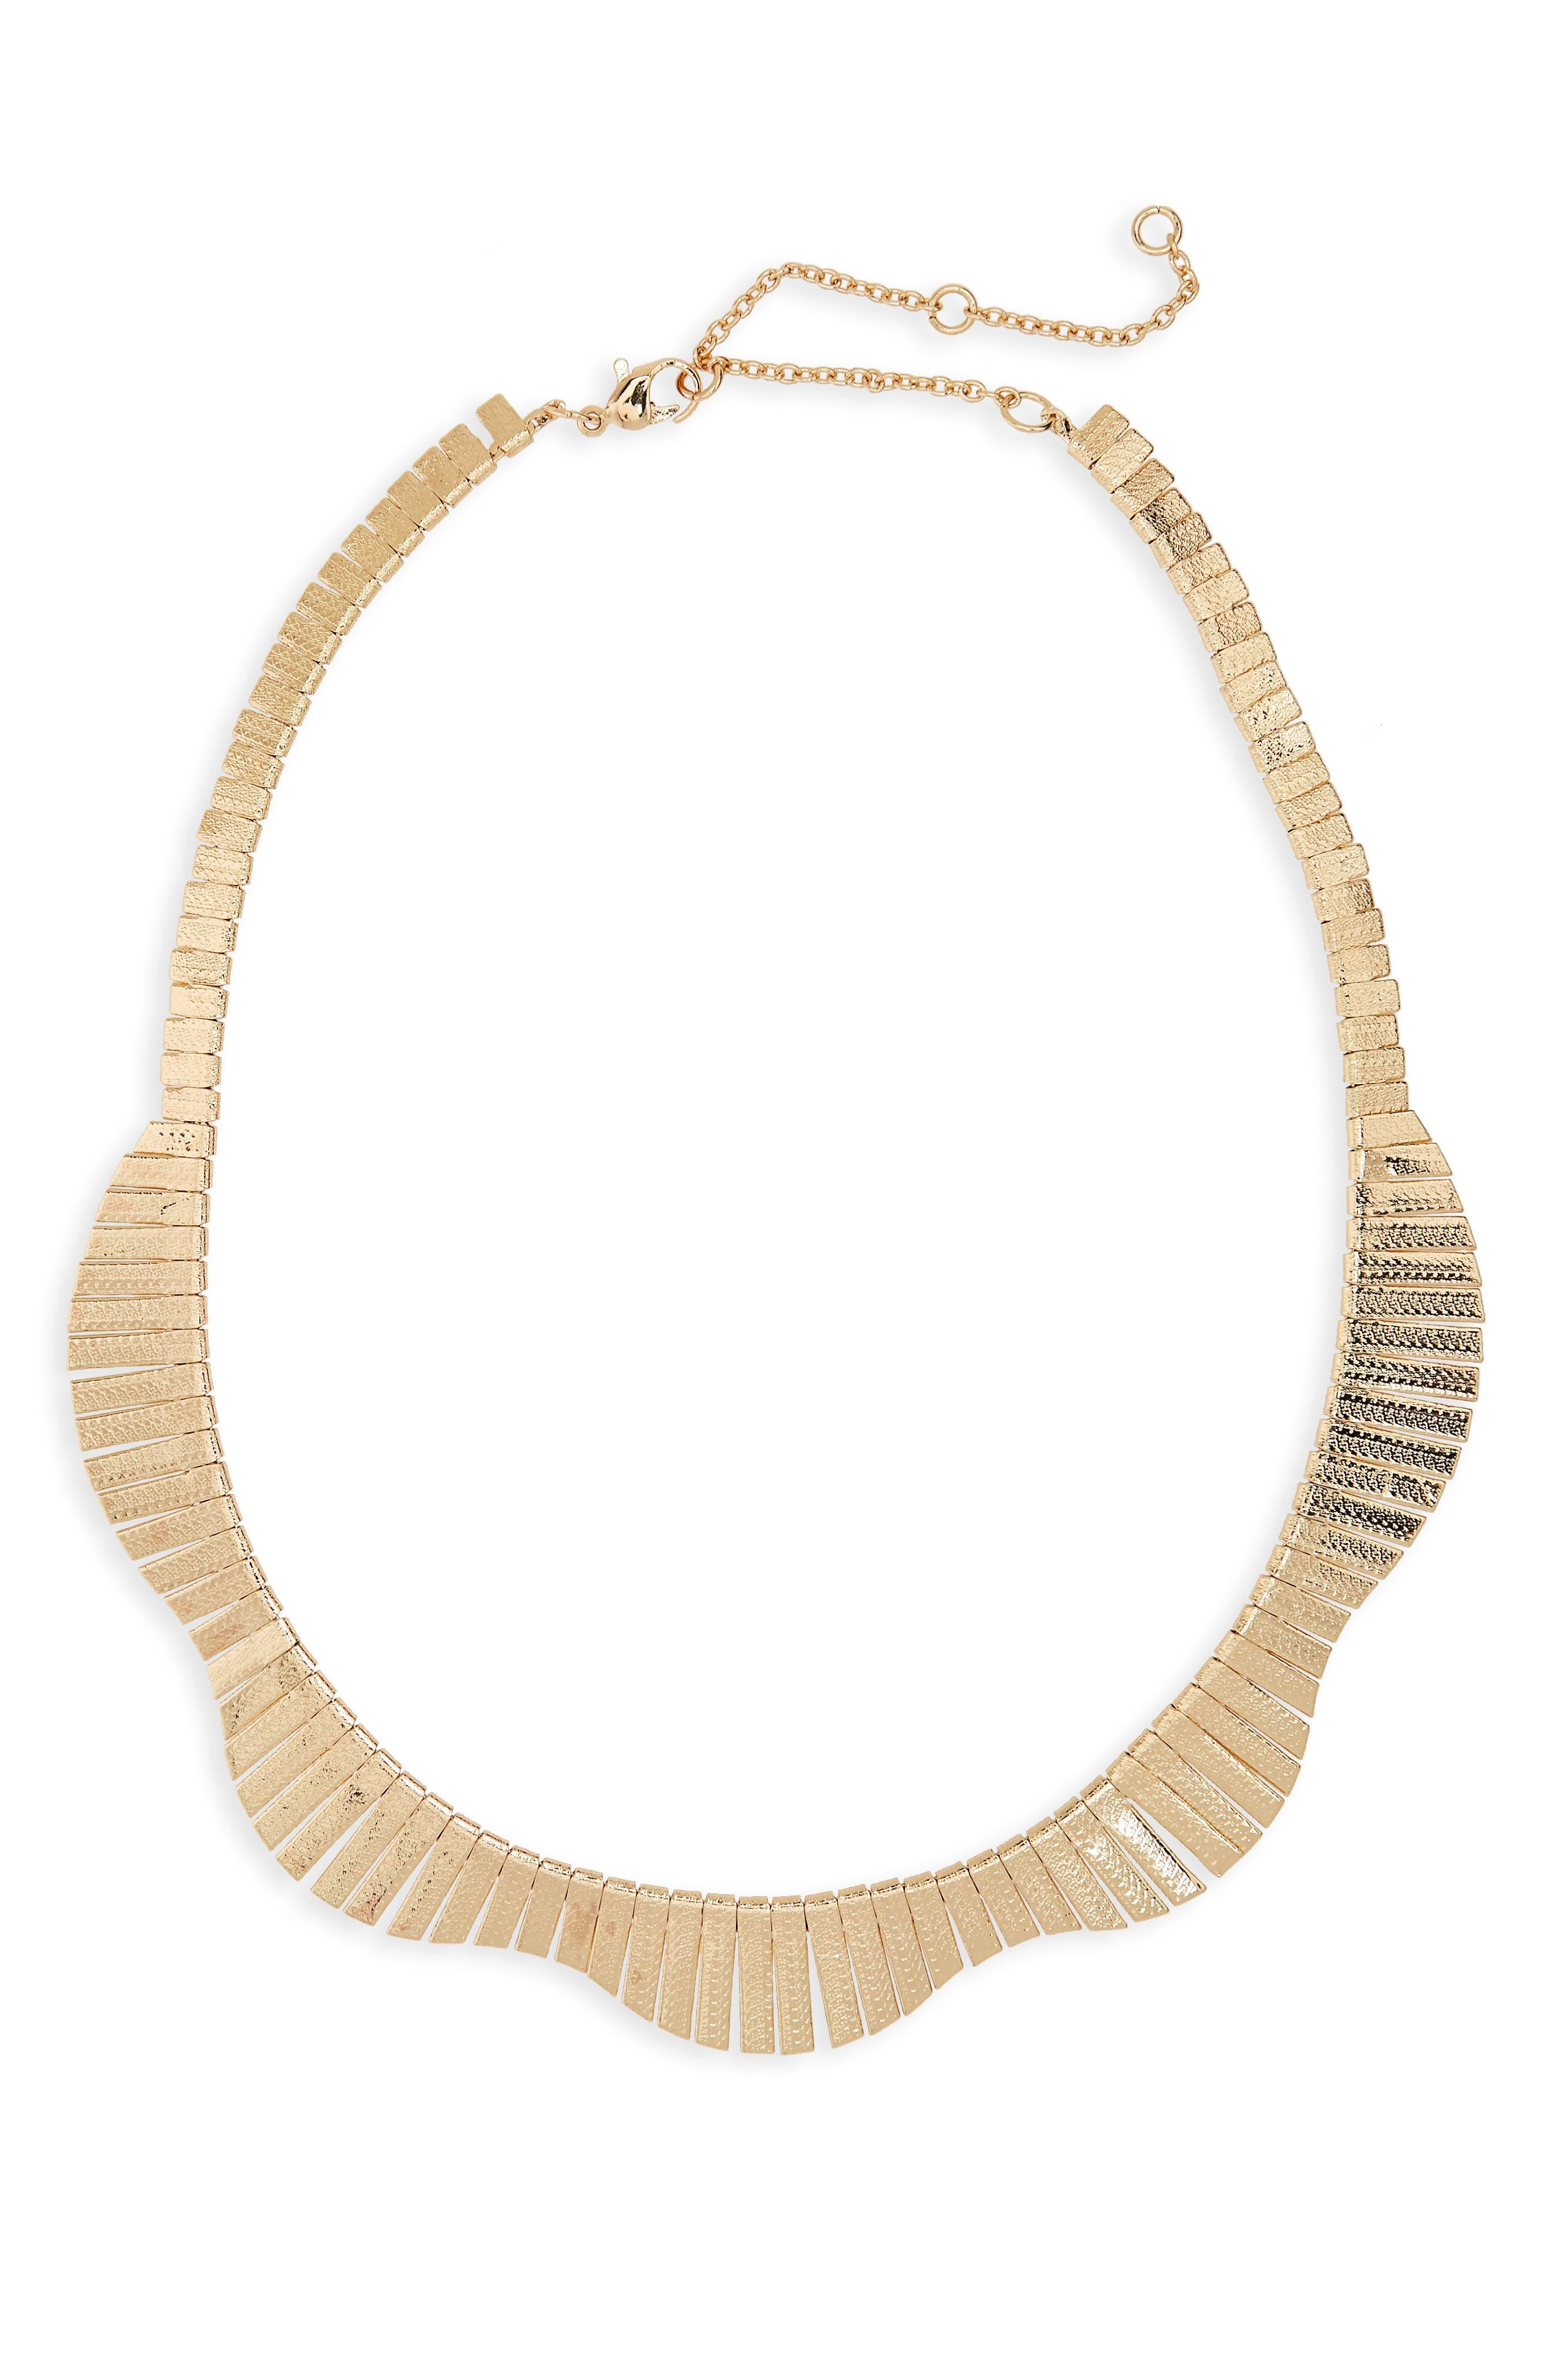 Collar Necklace,                             Main thumbnail 1, color,                             710